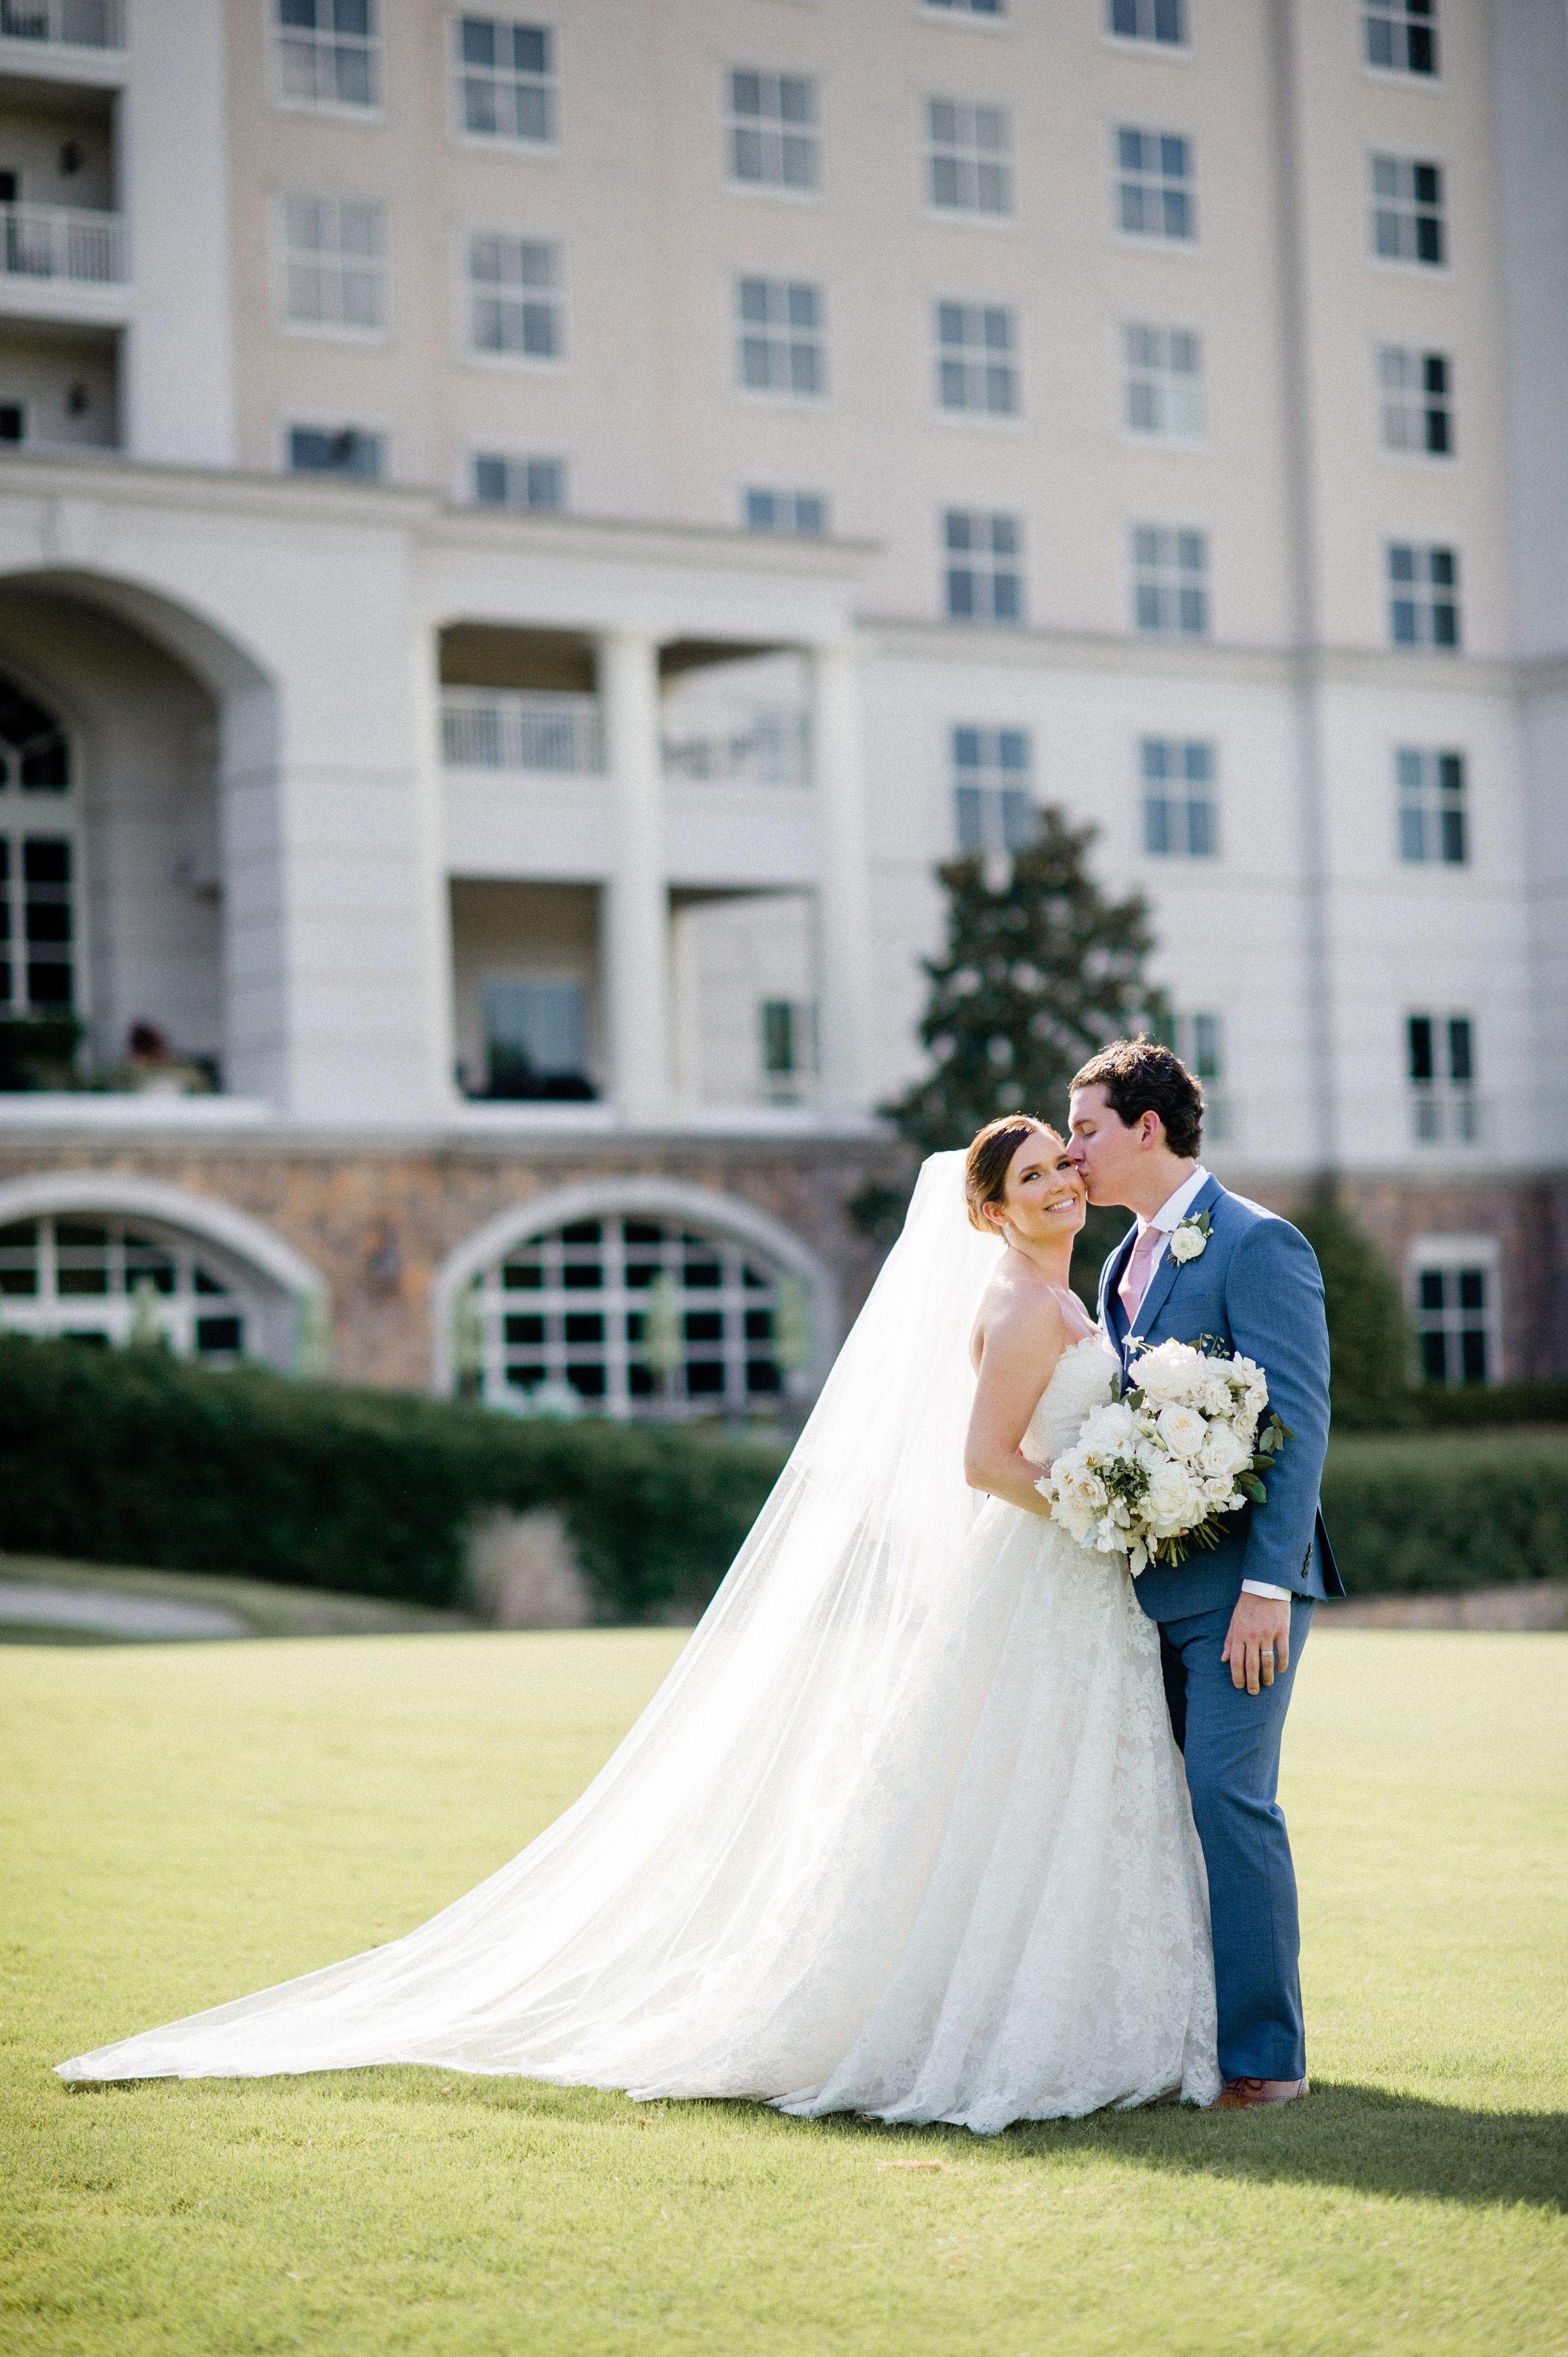 McElravey_Wedding_CarolineLimaPhotography_2018_241.jpg